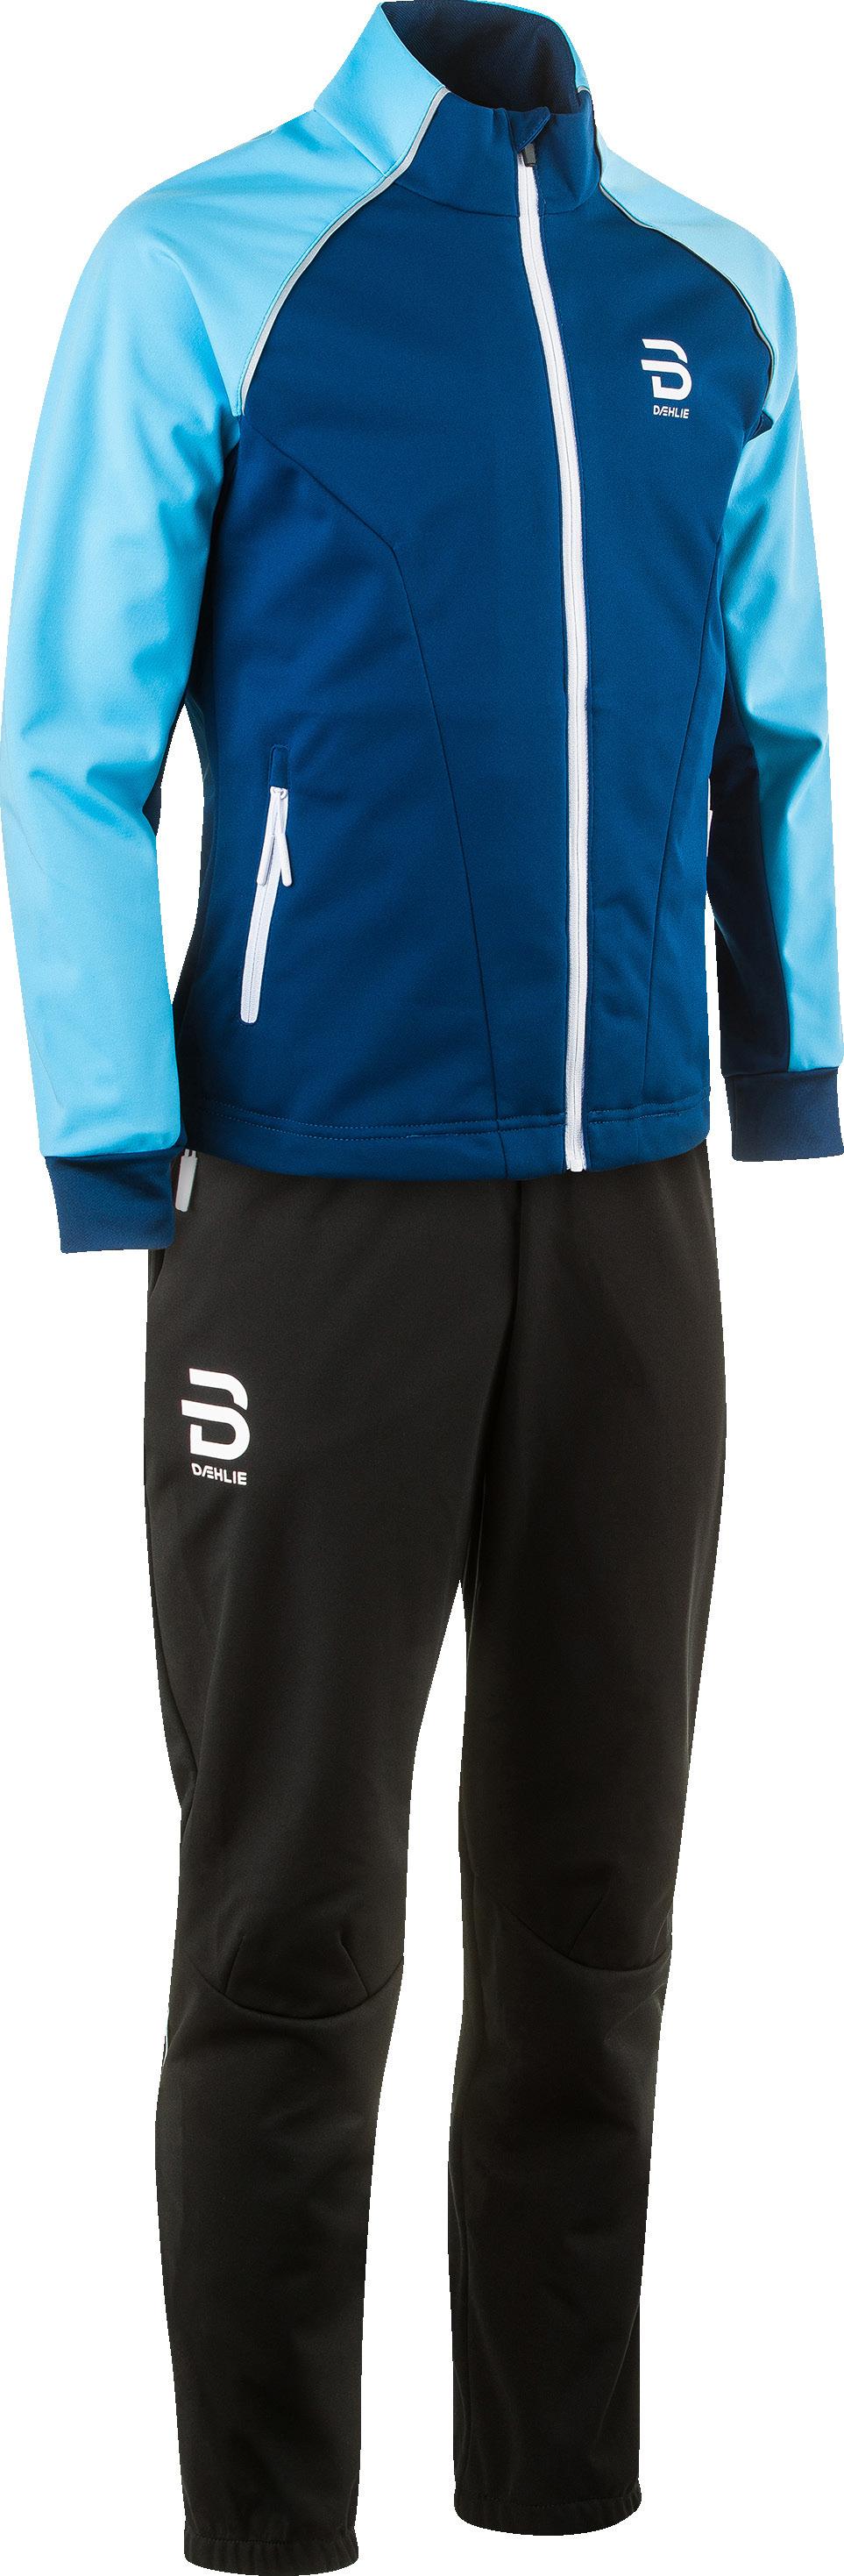 Комплект беговой Bjorn Daehlie 2019 20 Suit